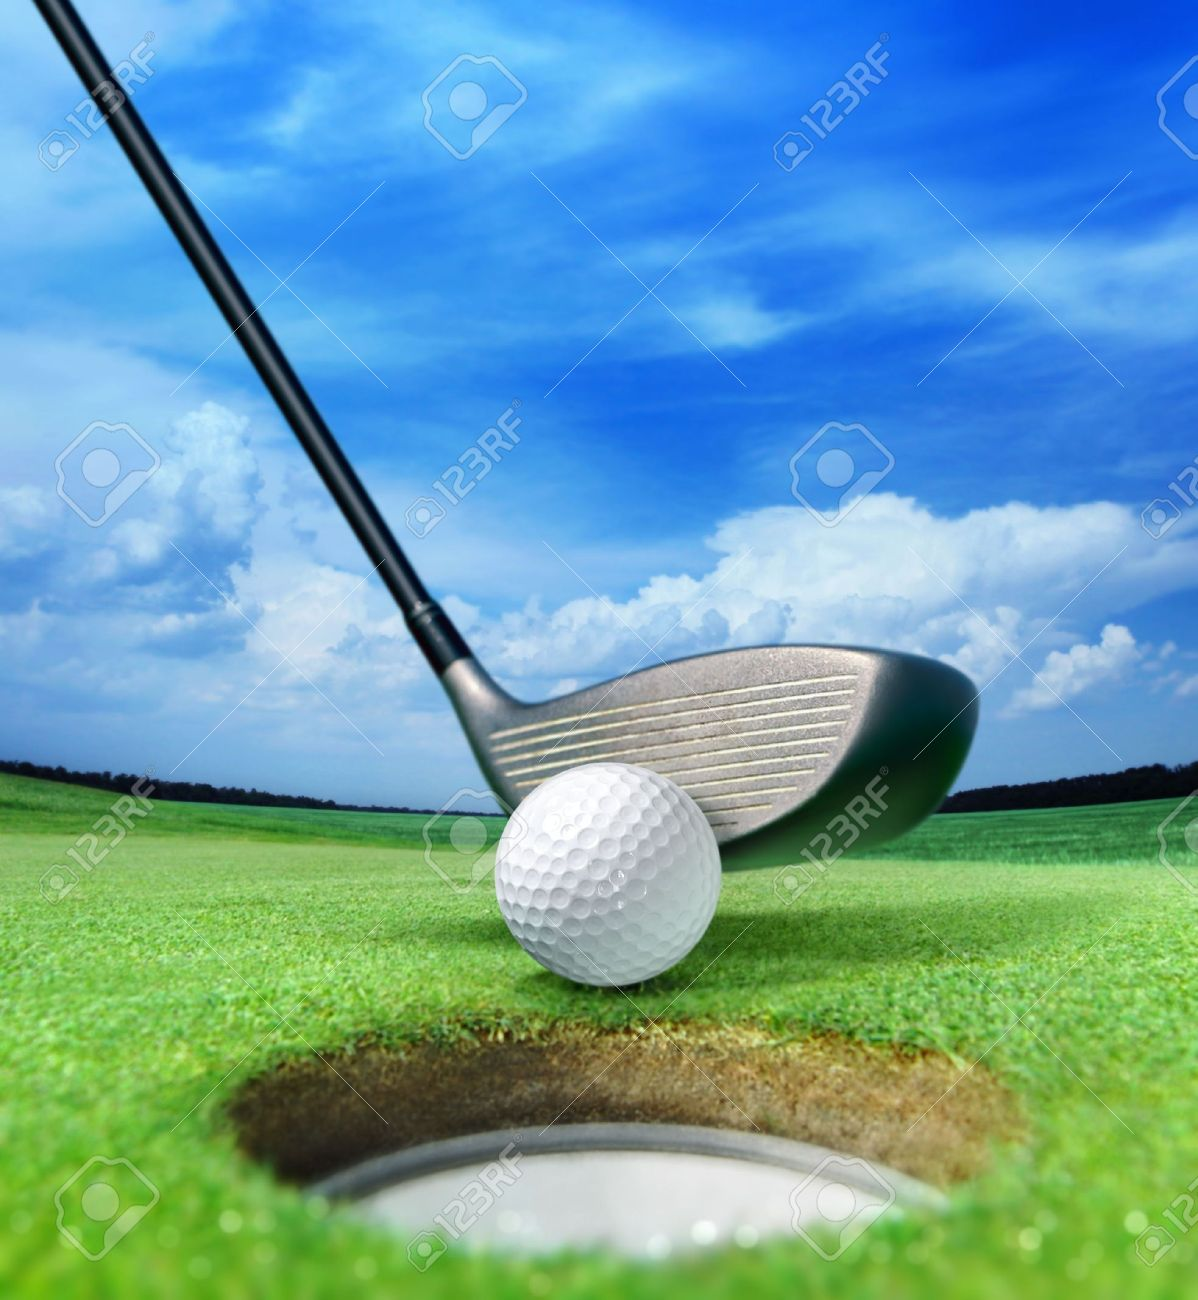 golf club stock photos royalty free golf club images